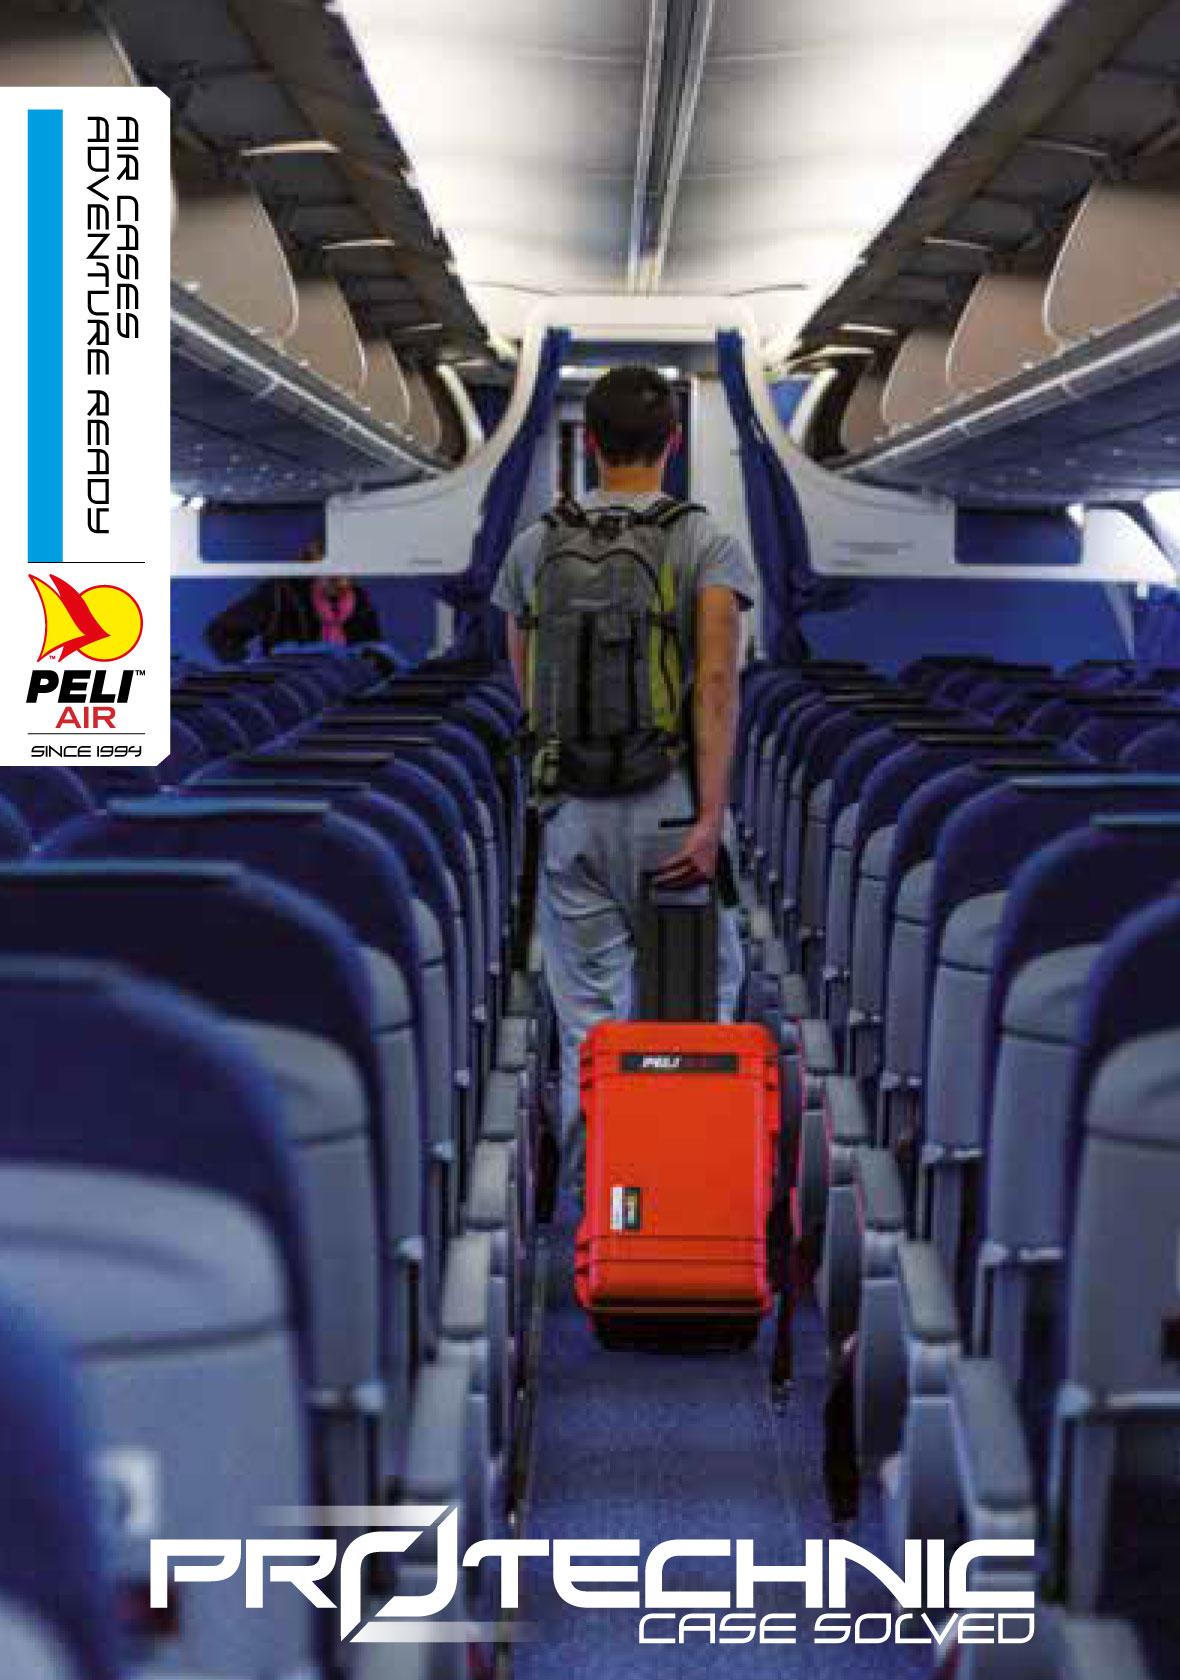 Plane-Luggage